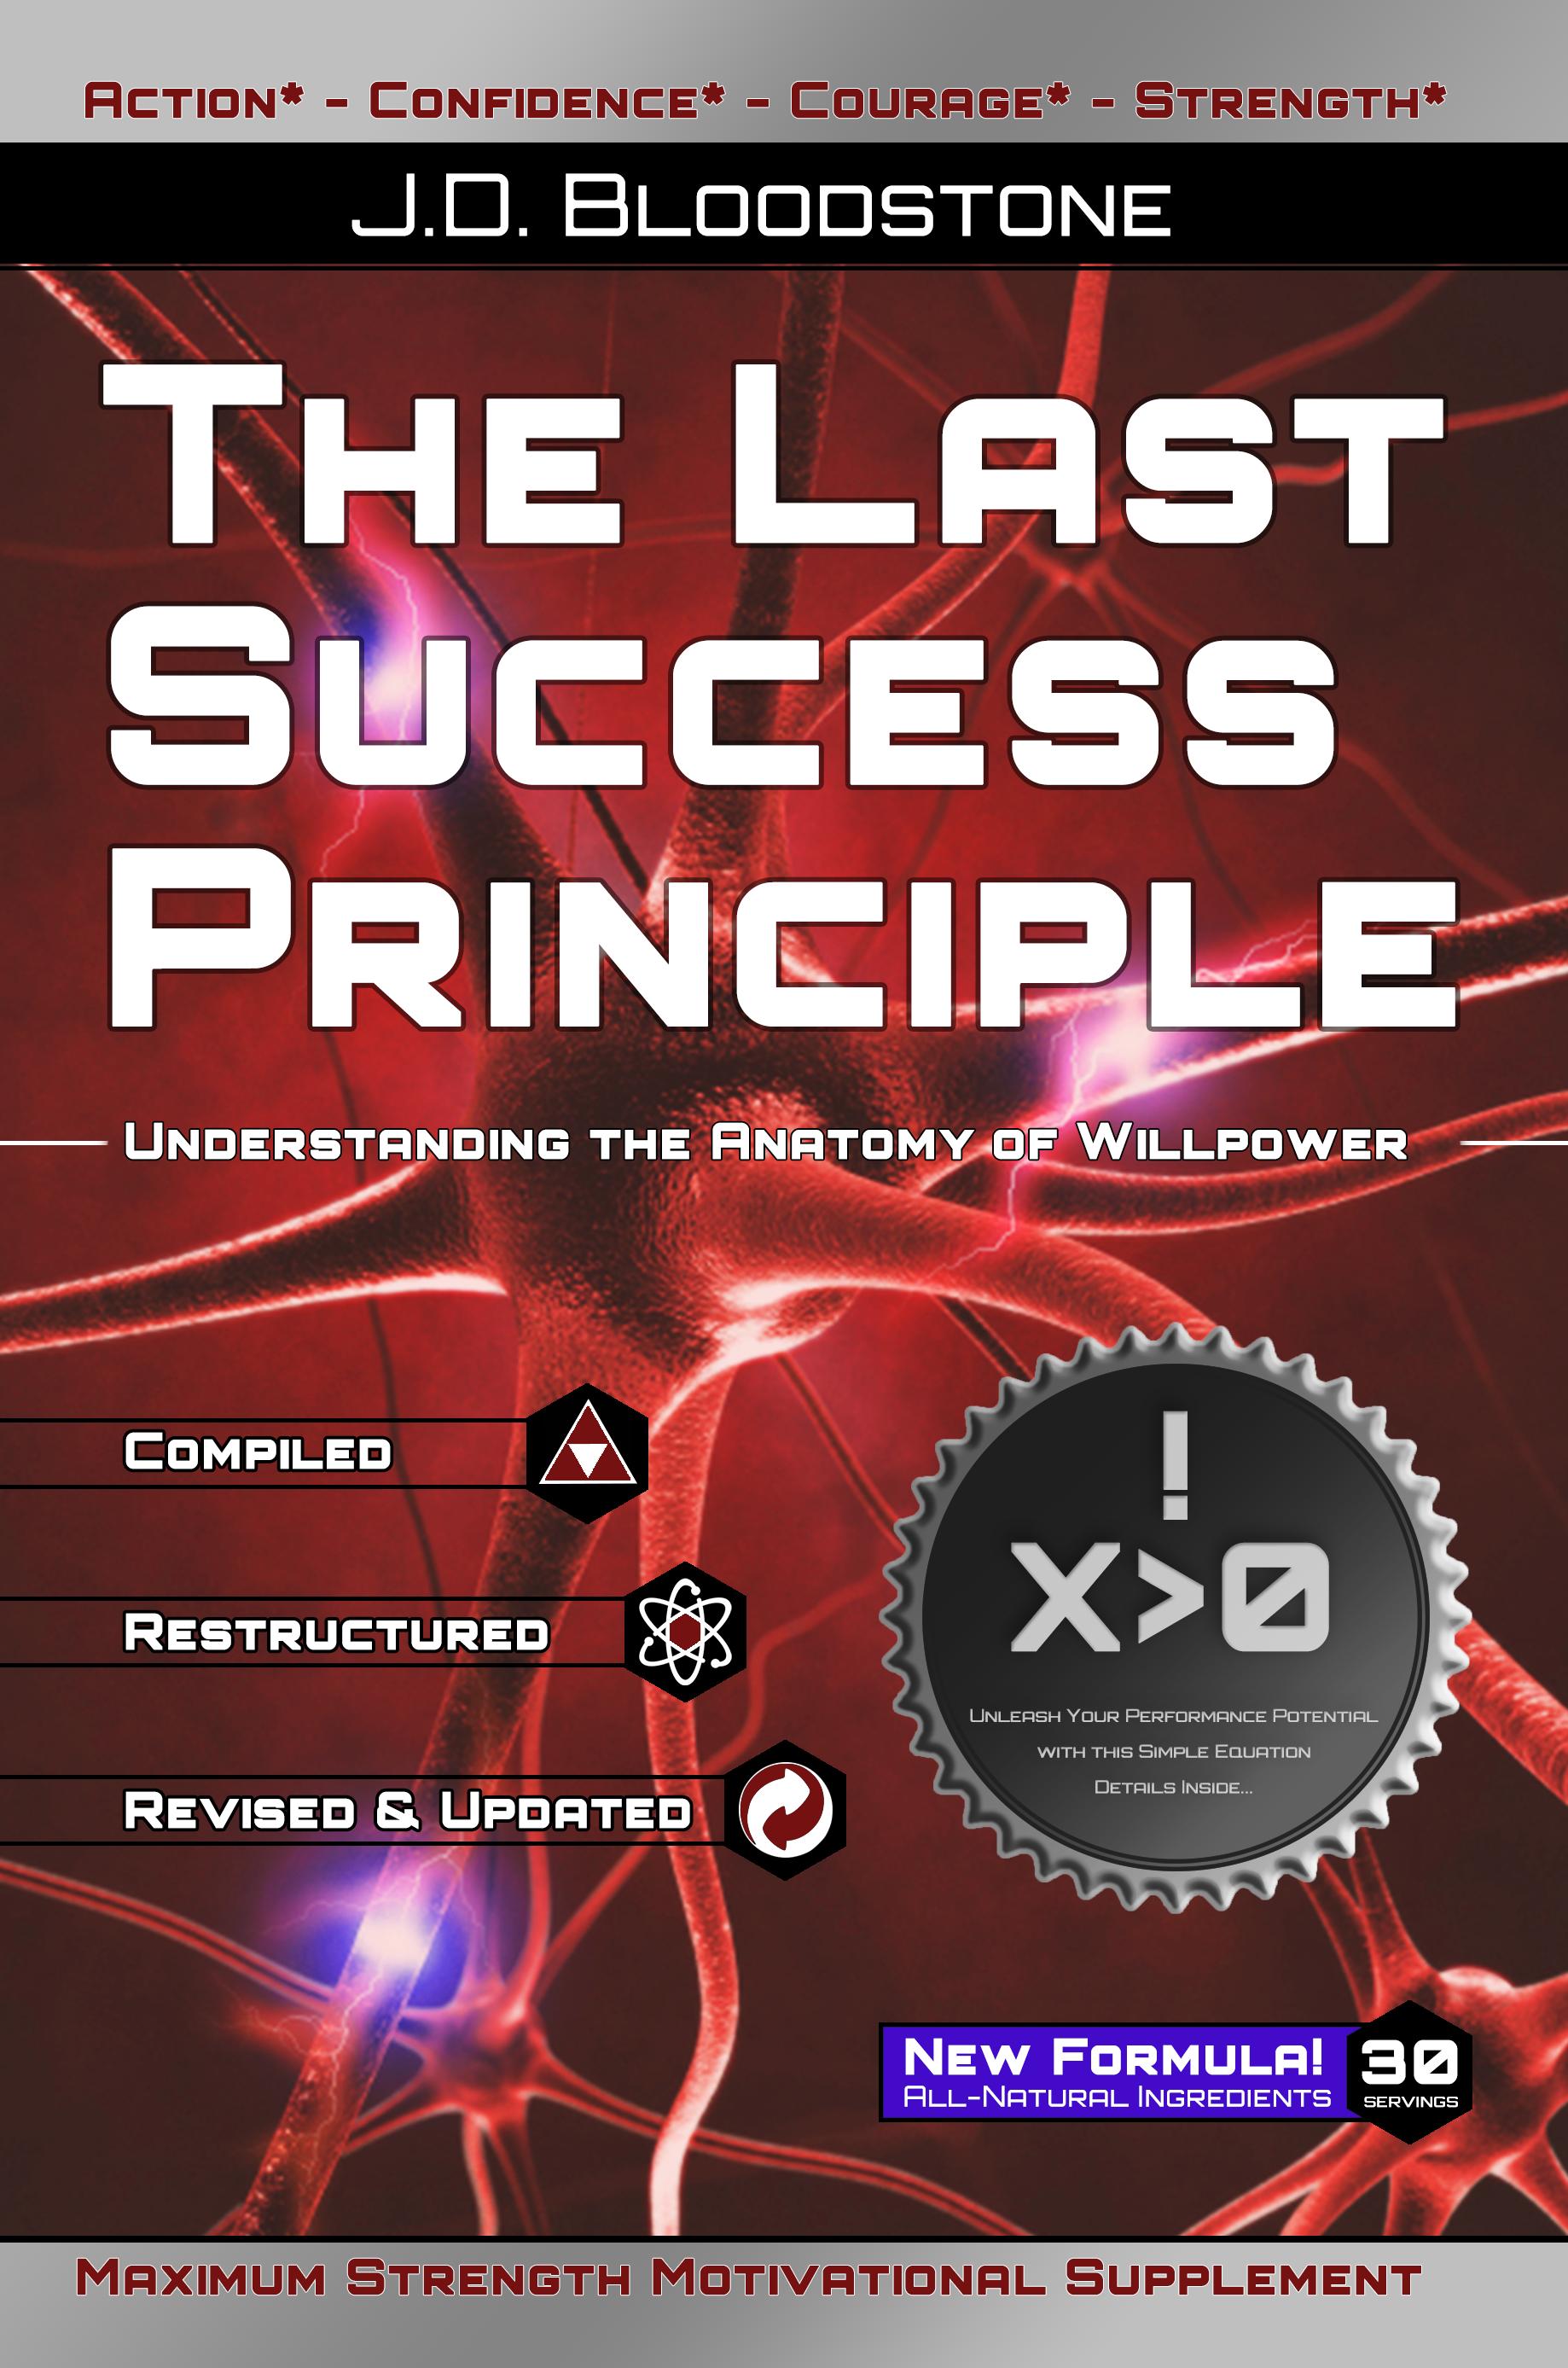 PREVIEW:  The Last Success Principle by J.D. Bloodstone